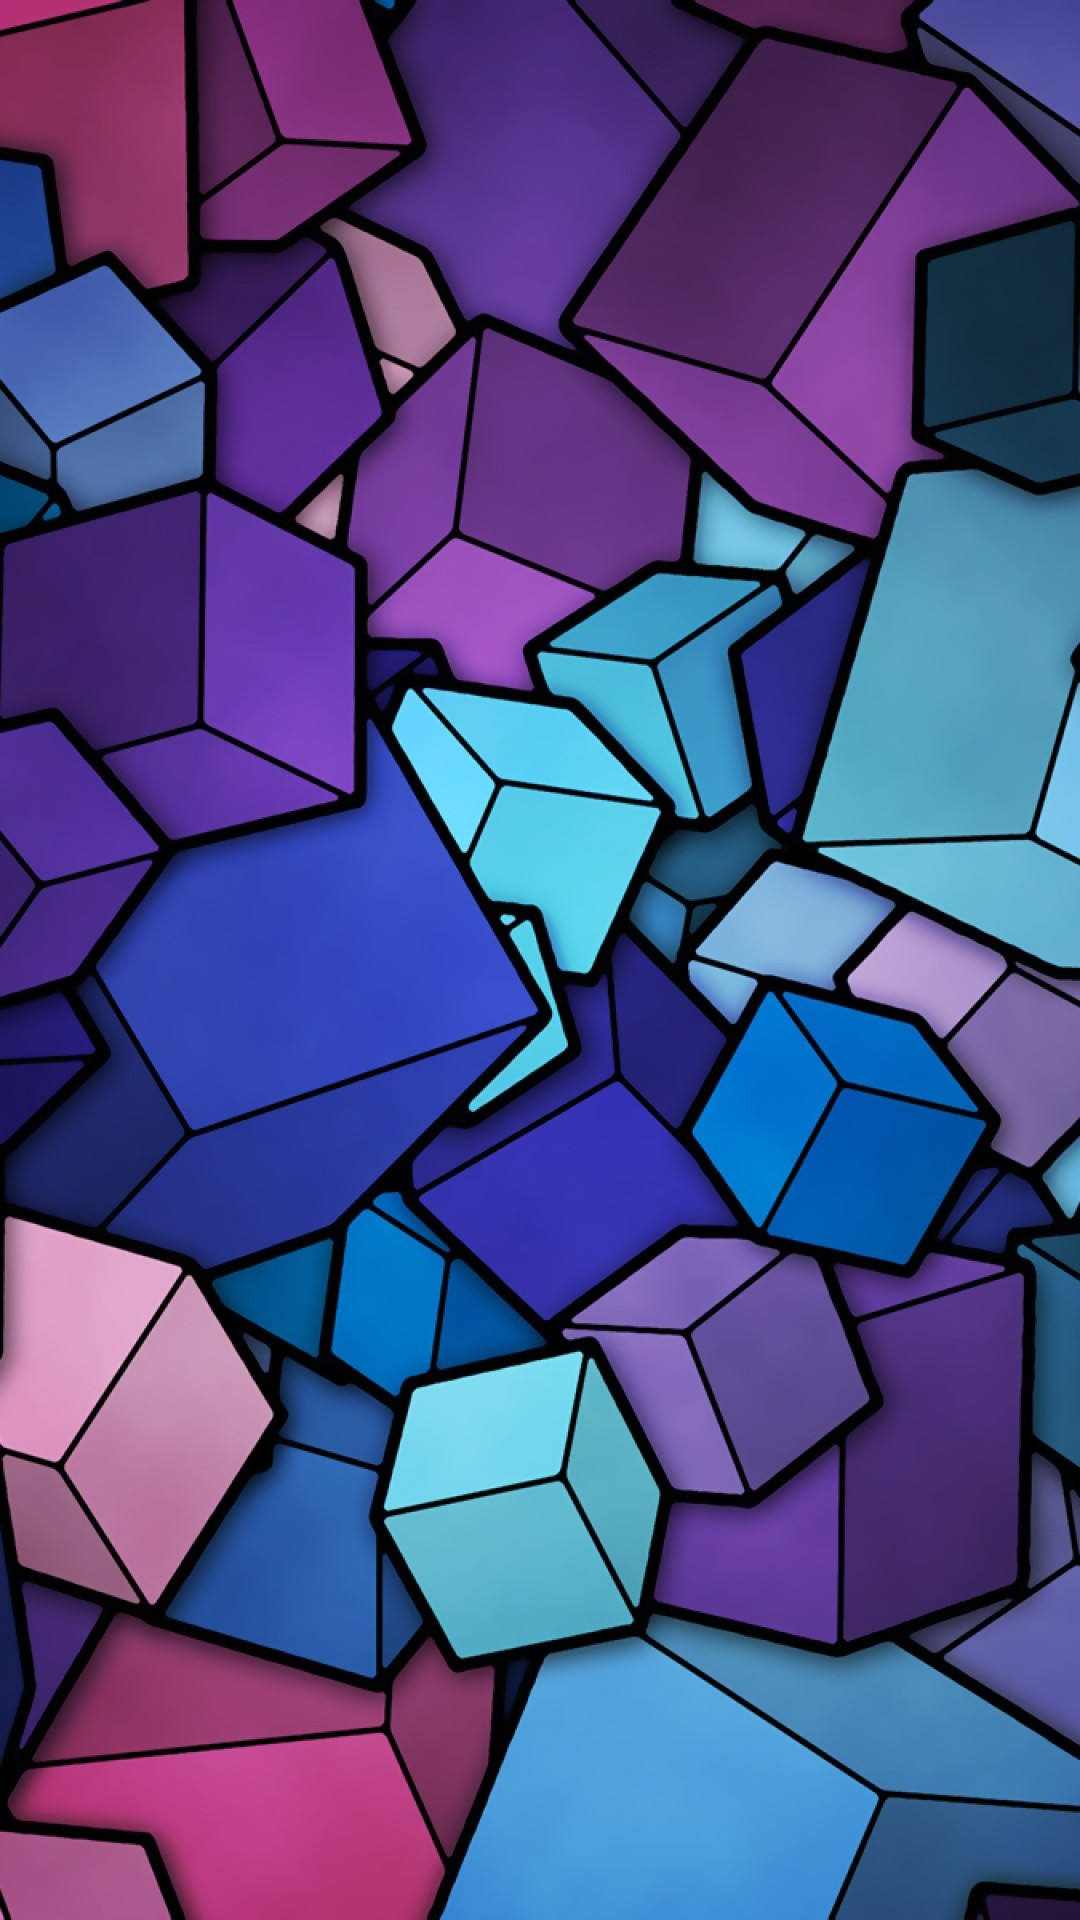 2048x2048 Colorful Ipad Air Wallpapers Hd 107 Retina